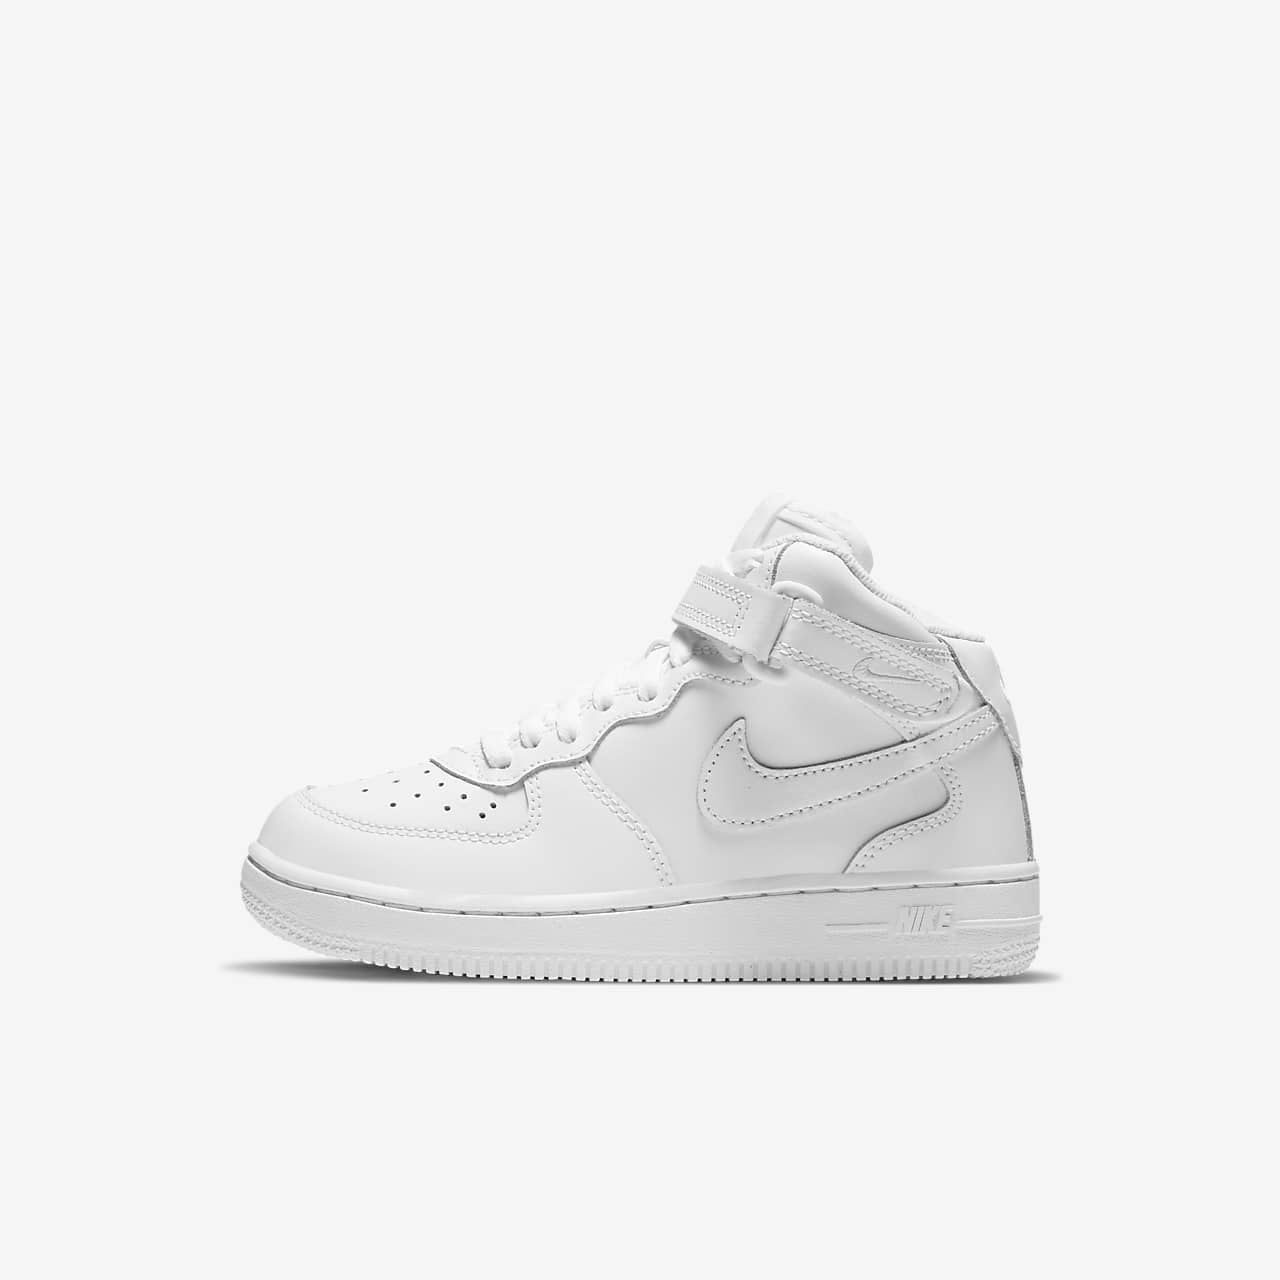 newest 14554 987a4 ... Nike Air Force 1 Mid Schuh für jüngere Kinder